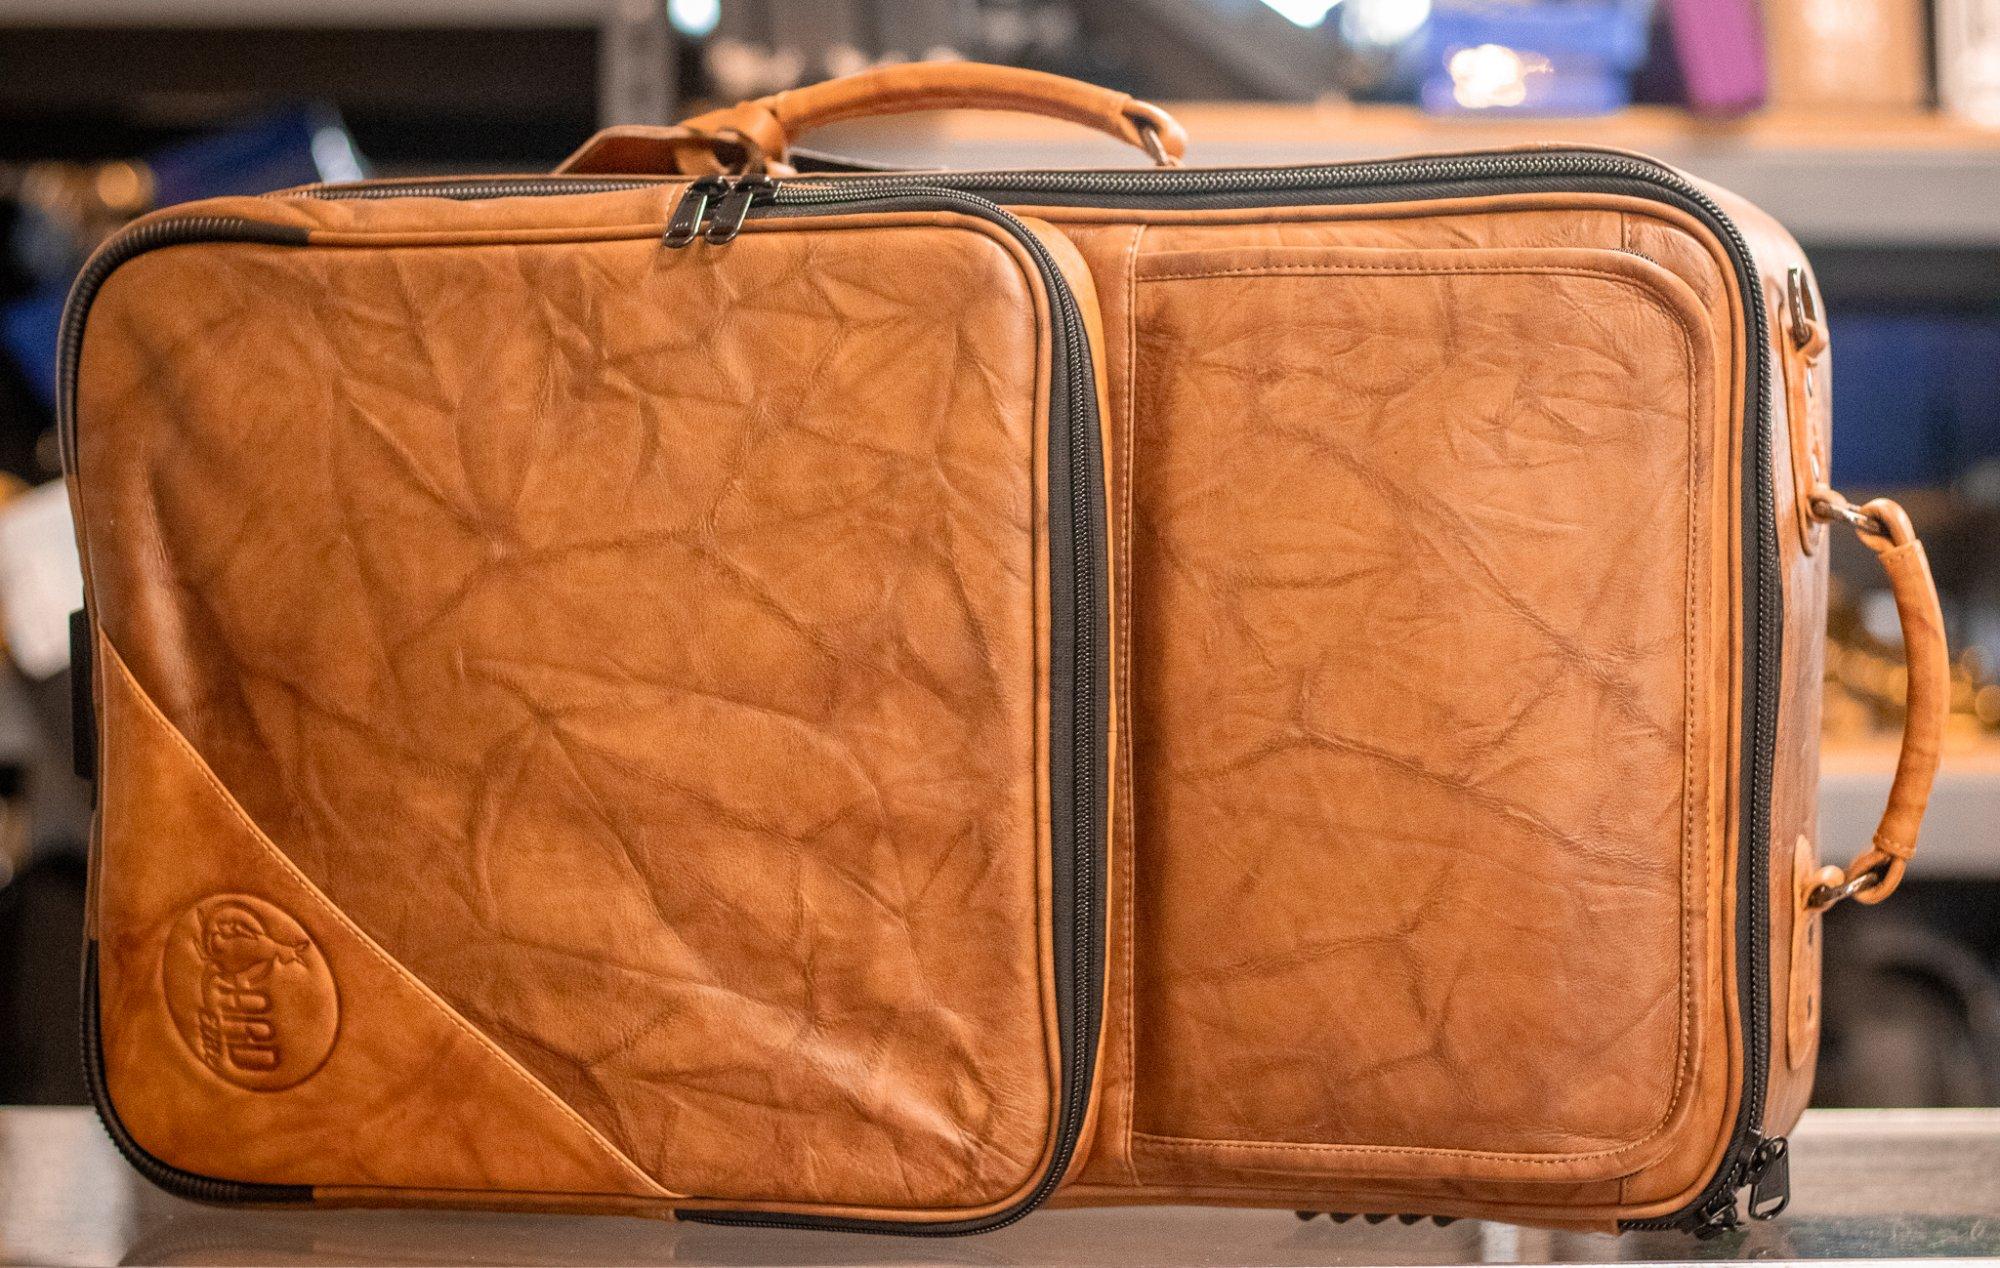 9-ECLN-LT GARD Elite - Compact Trumpet/Flugelhorn Gig Bag in Marbled Tan Leather